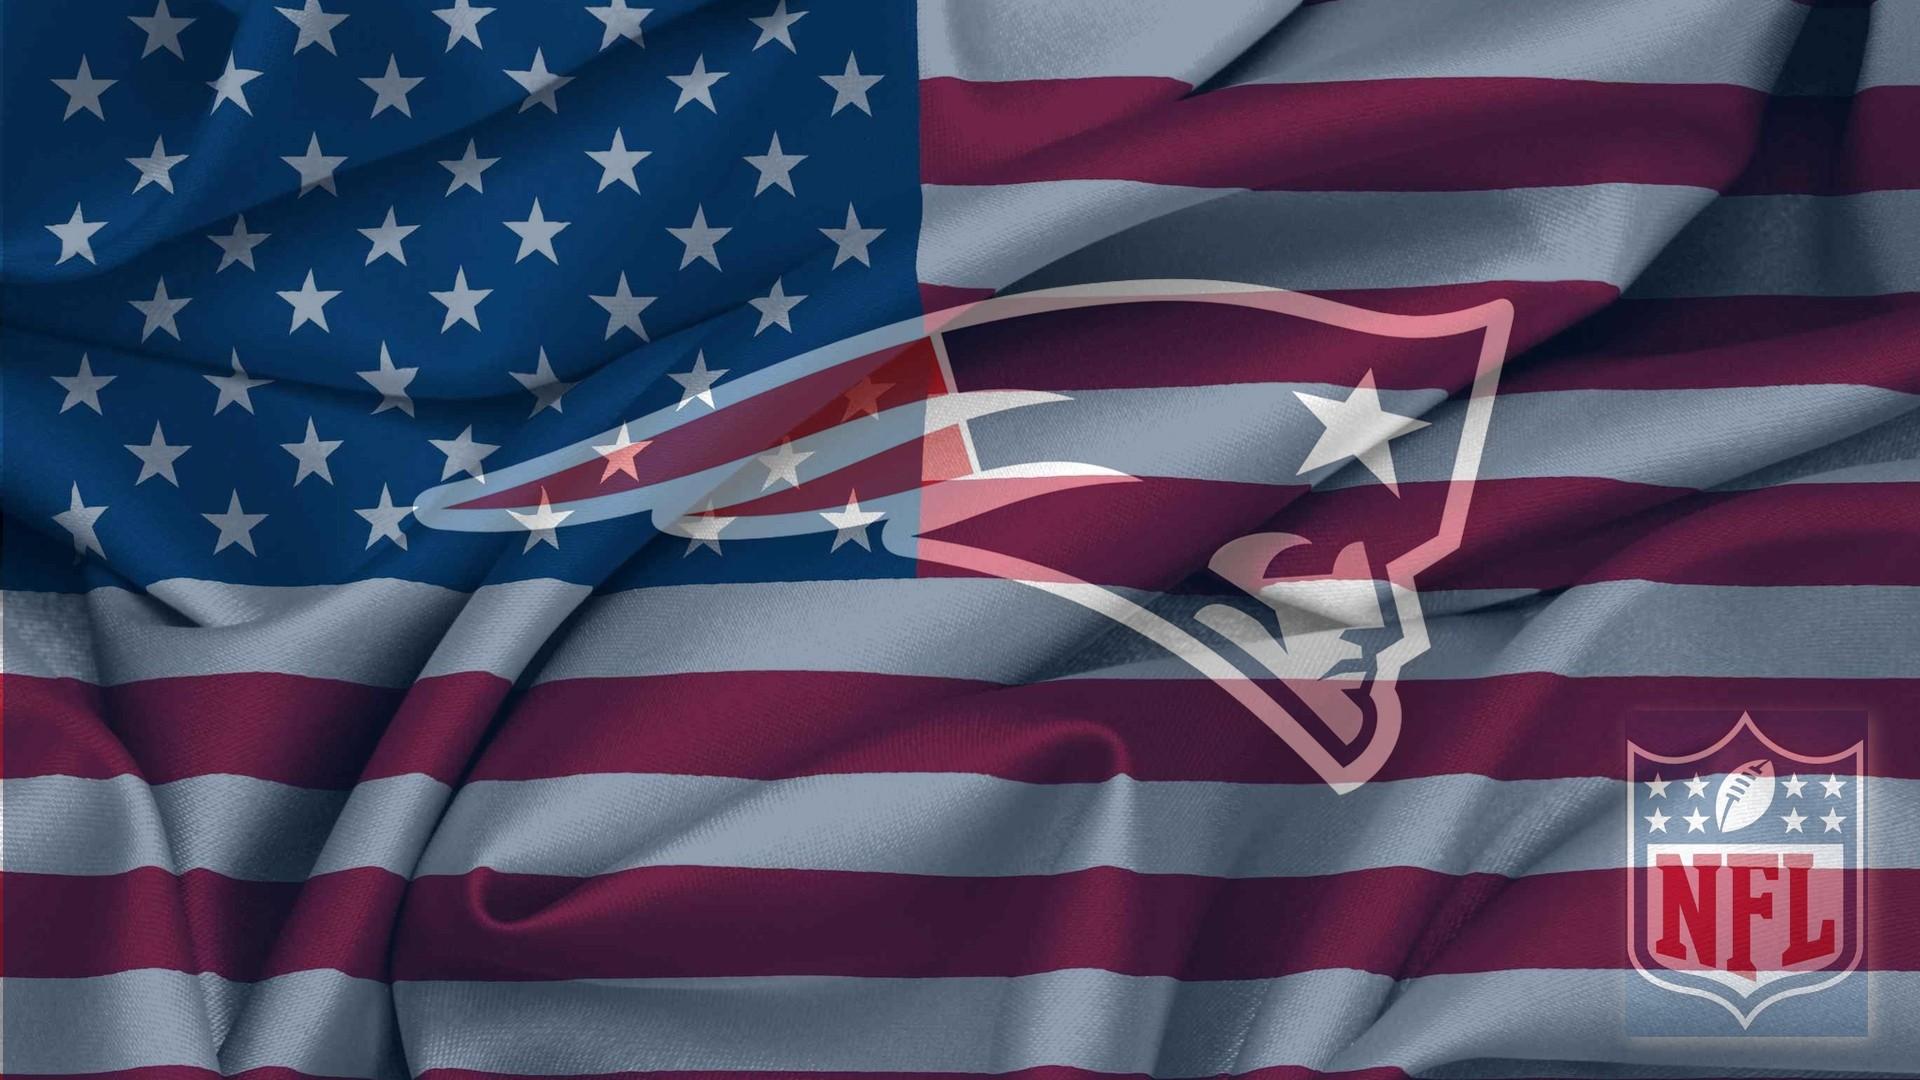 New England Patriots Logo With NFL Logo On USA Flag Wavy Canvas 1920x1080